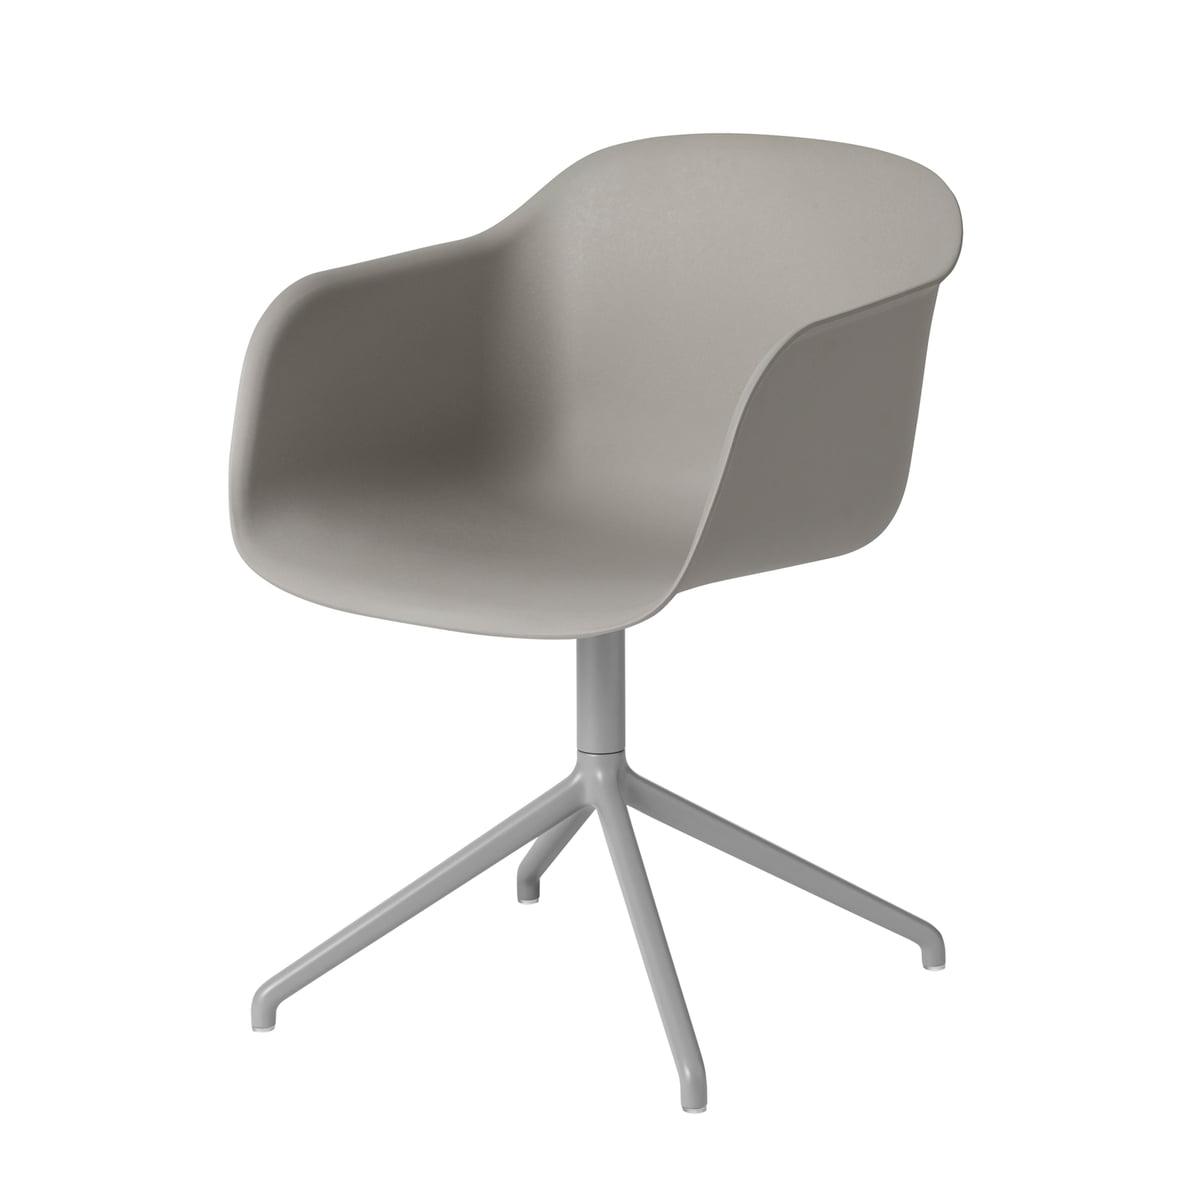 Delightful Muuto   Fiber Chair   Swivel Base, Grey / Grey